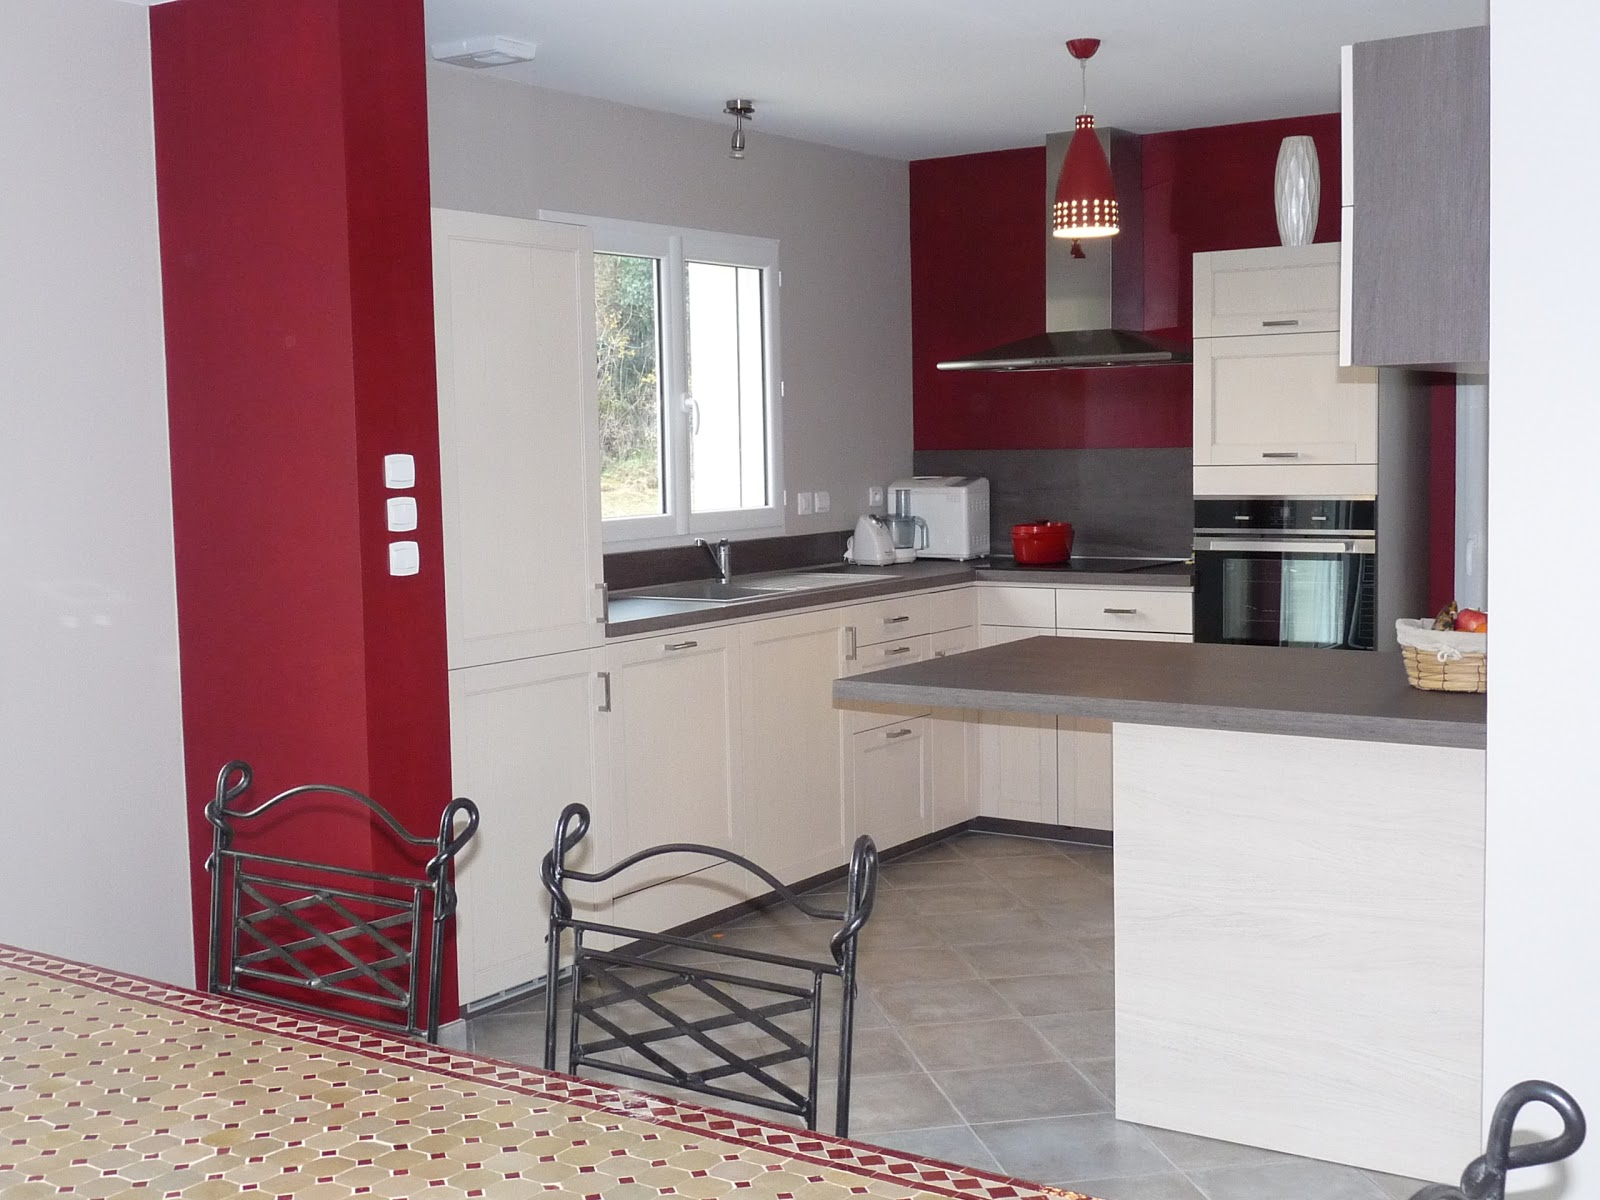 veranda brico depot great promos de brico dpt dans le. Black Bedroom Furniture Sets. Home Design Ideas